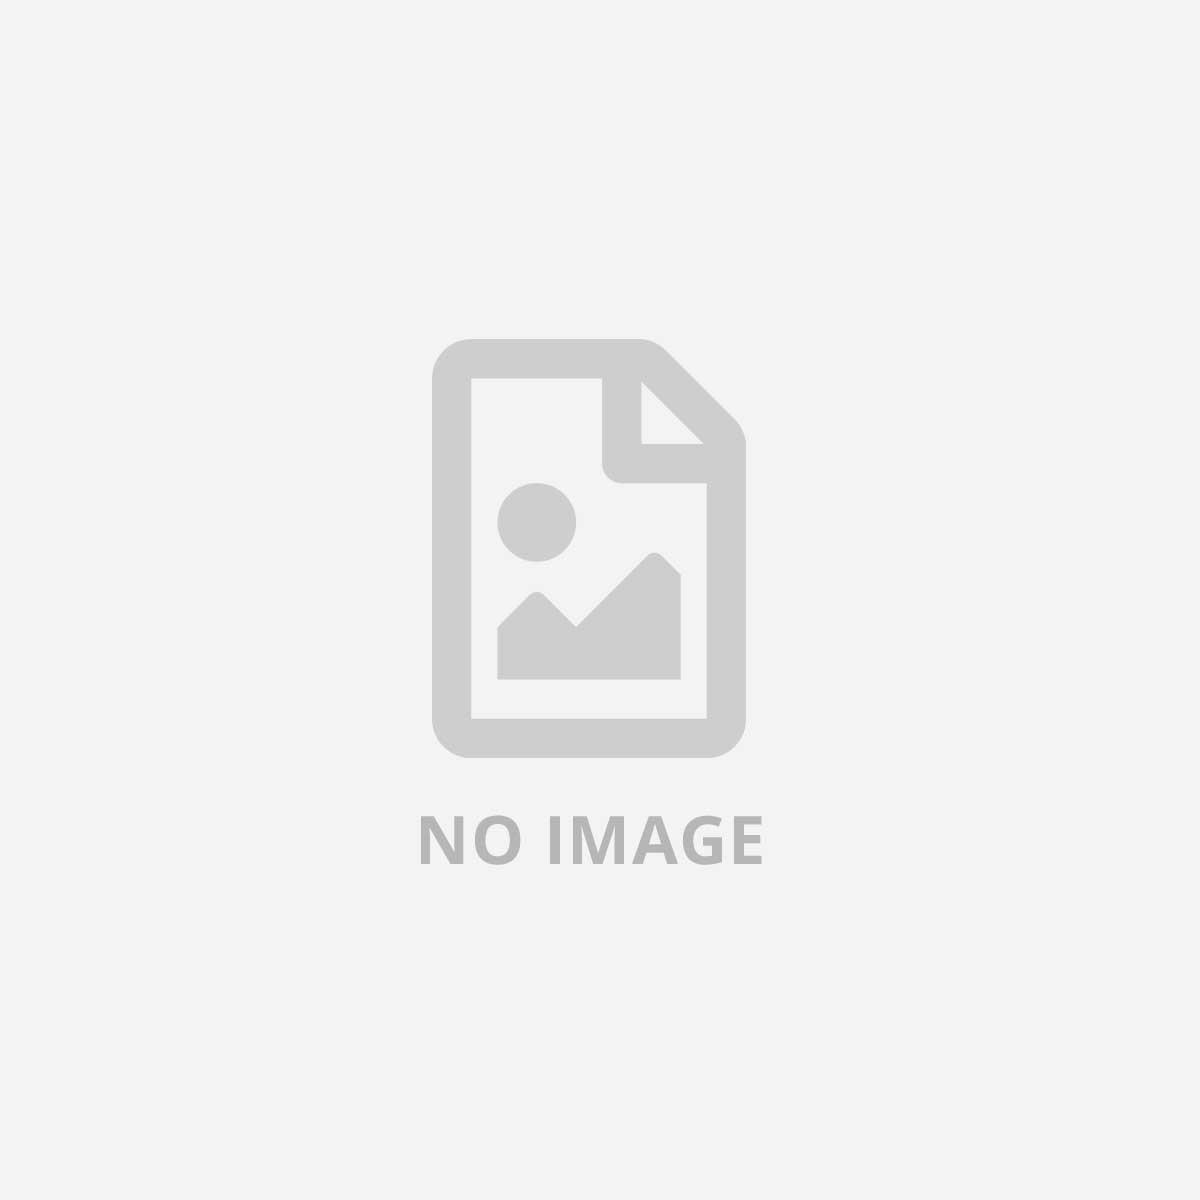 TOSHIBA HDD 2 5P 500GB 8MB 5400R